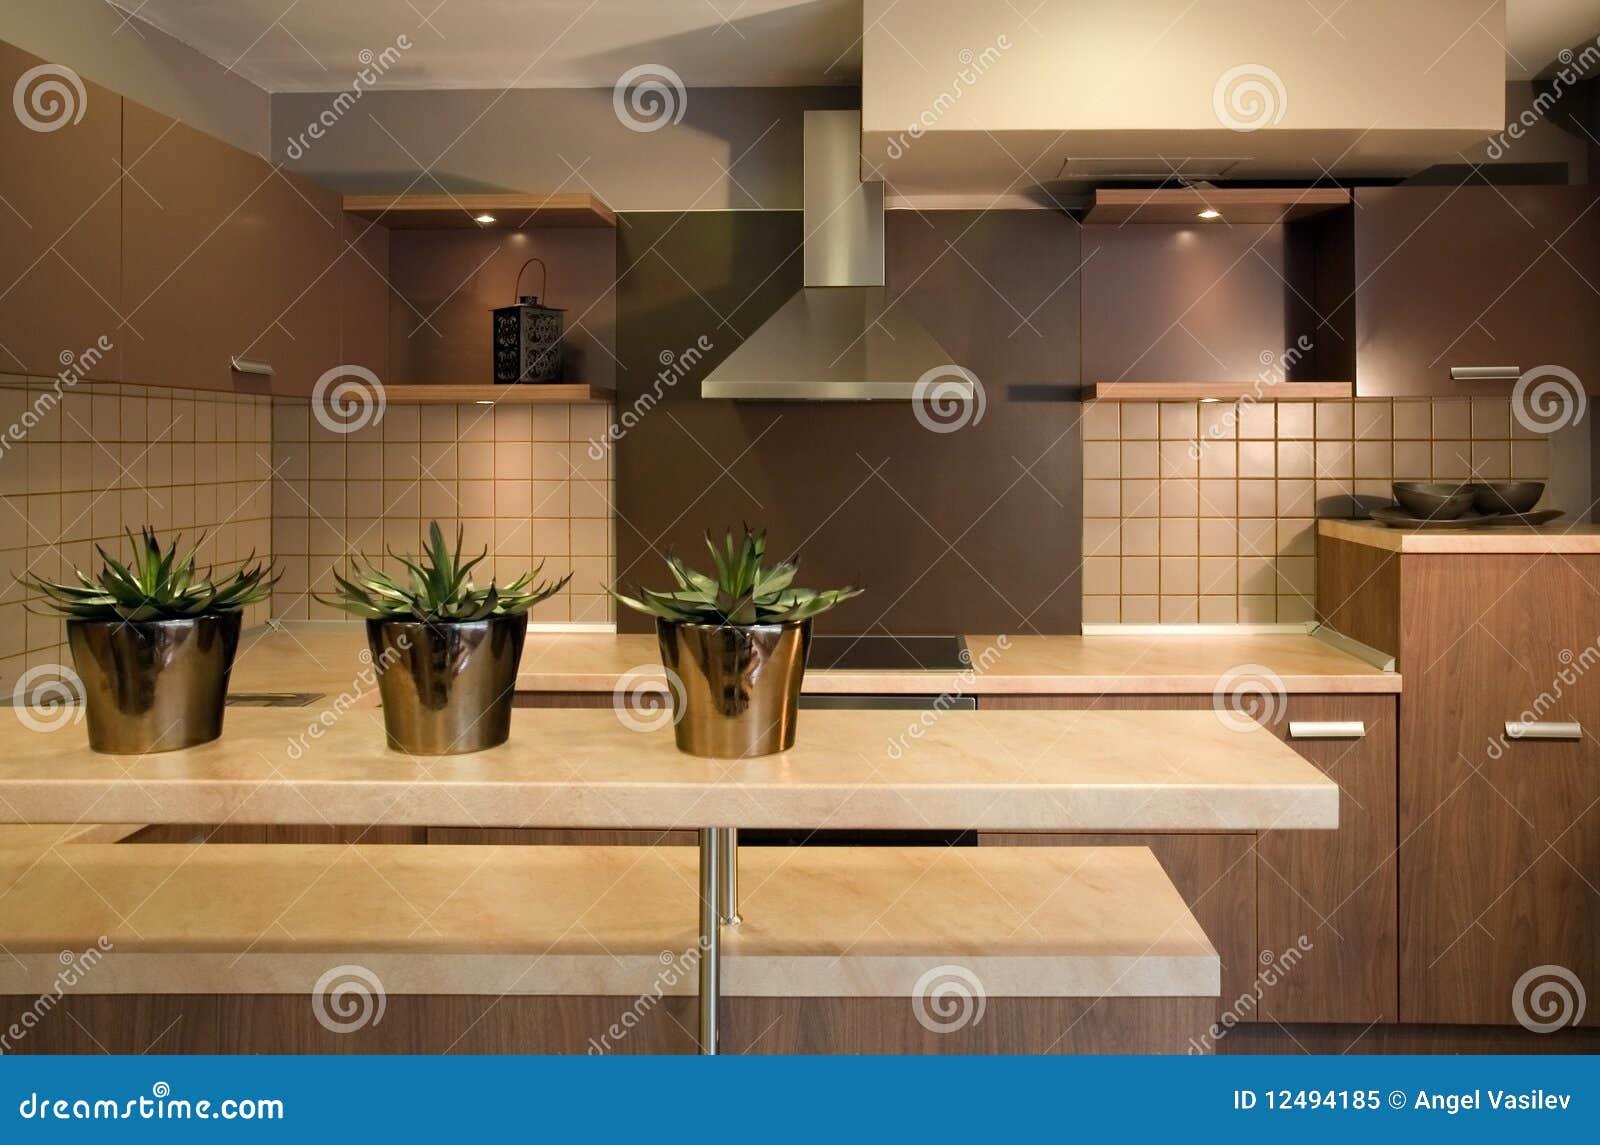 Projeto Interior Da Cozinha. Elegante E Luxuoso. Foto de Stock Royalty  #86AB20 1300 947